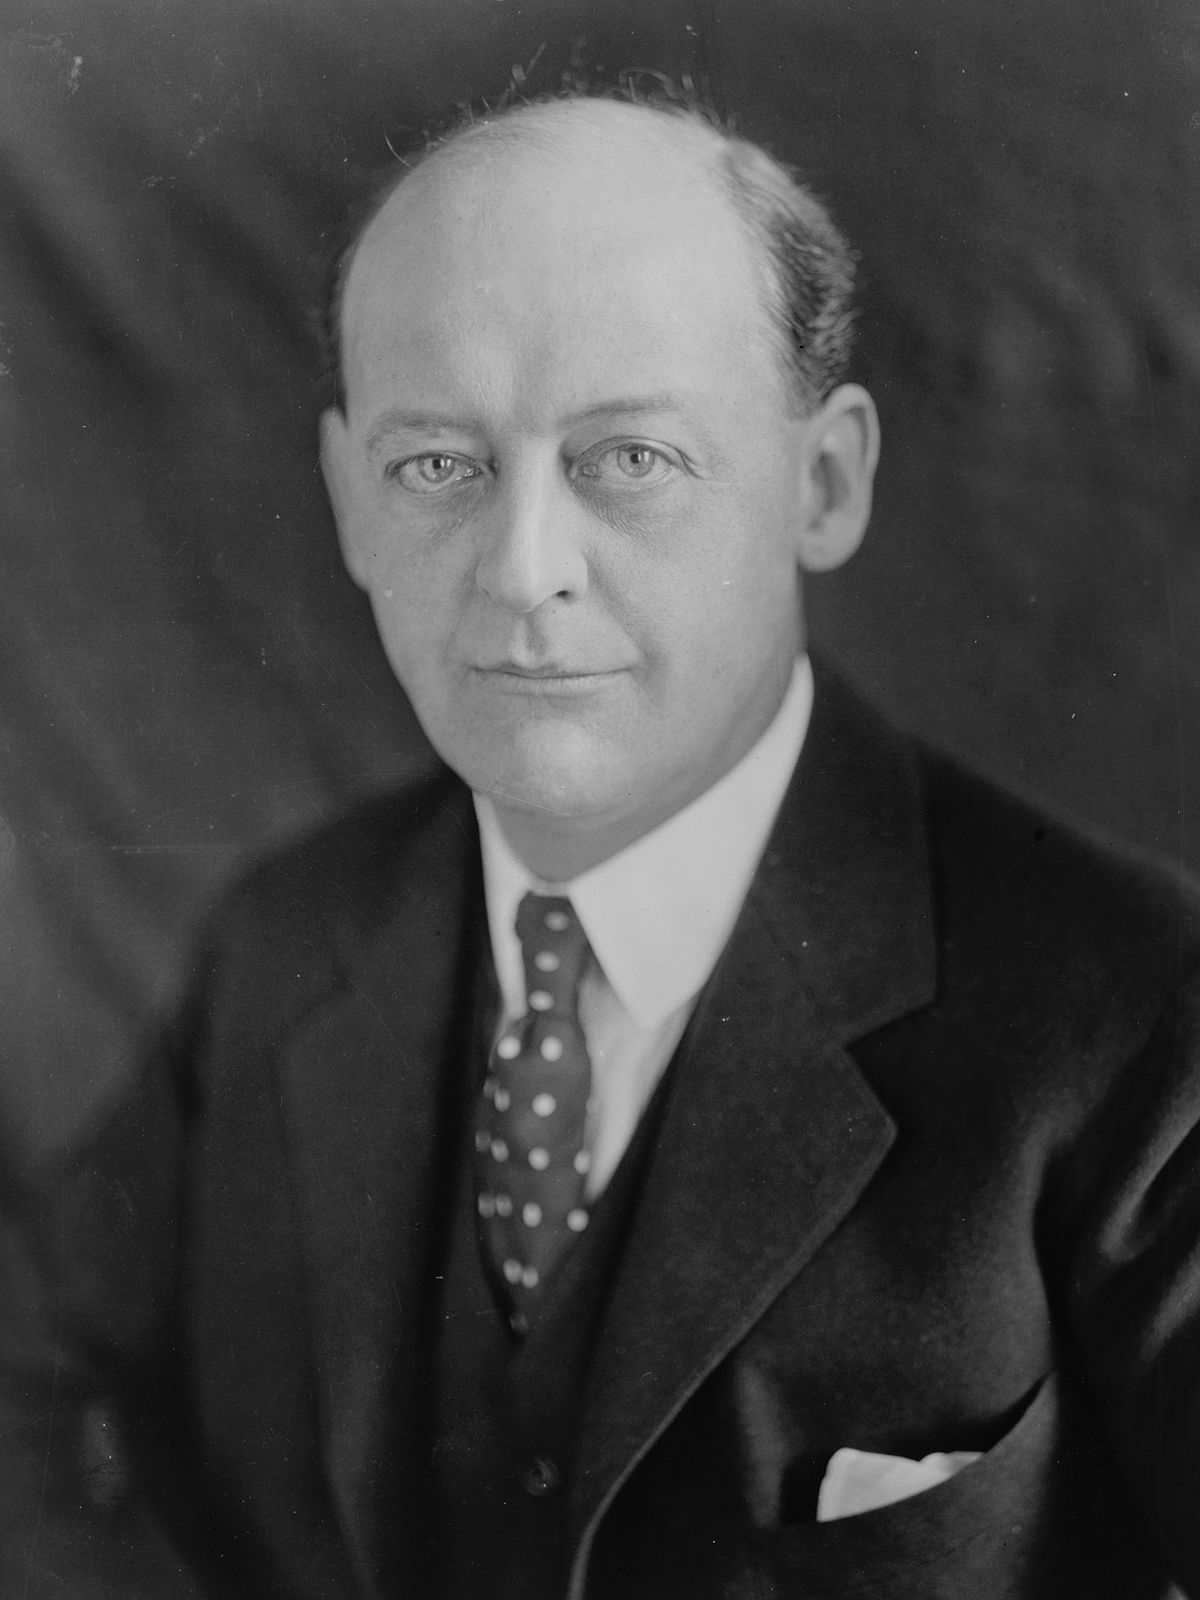 James Wolcott Wadsworth Jr. - Wikipedia